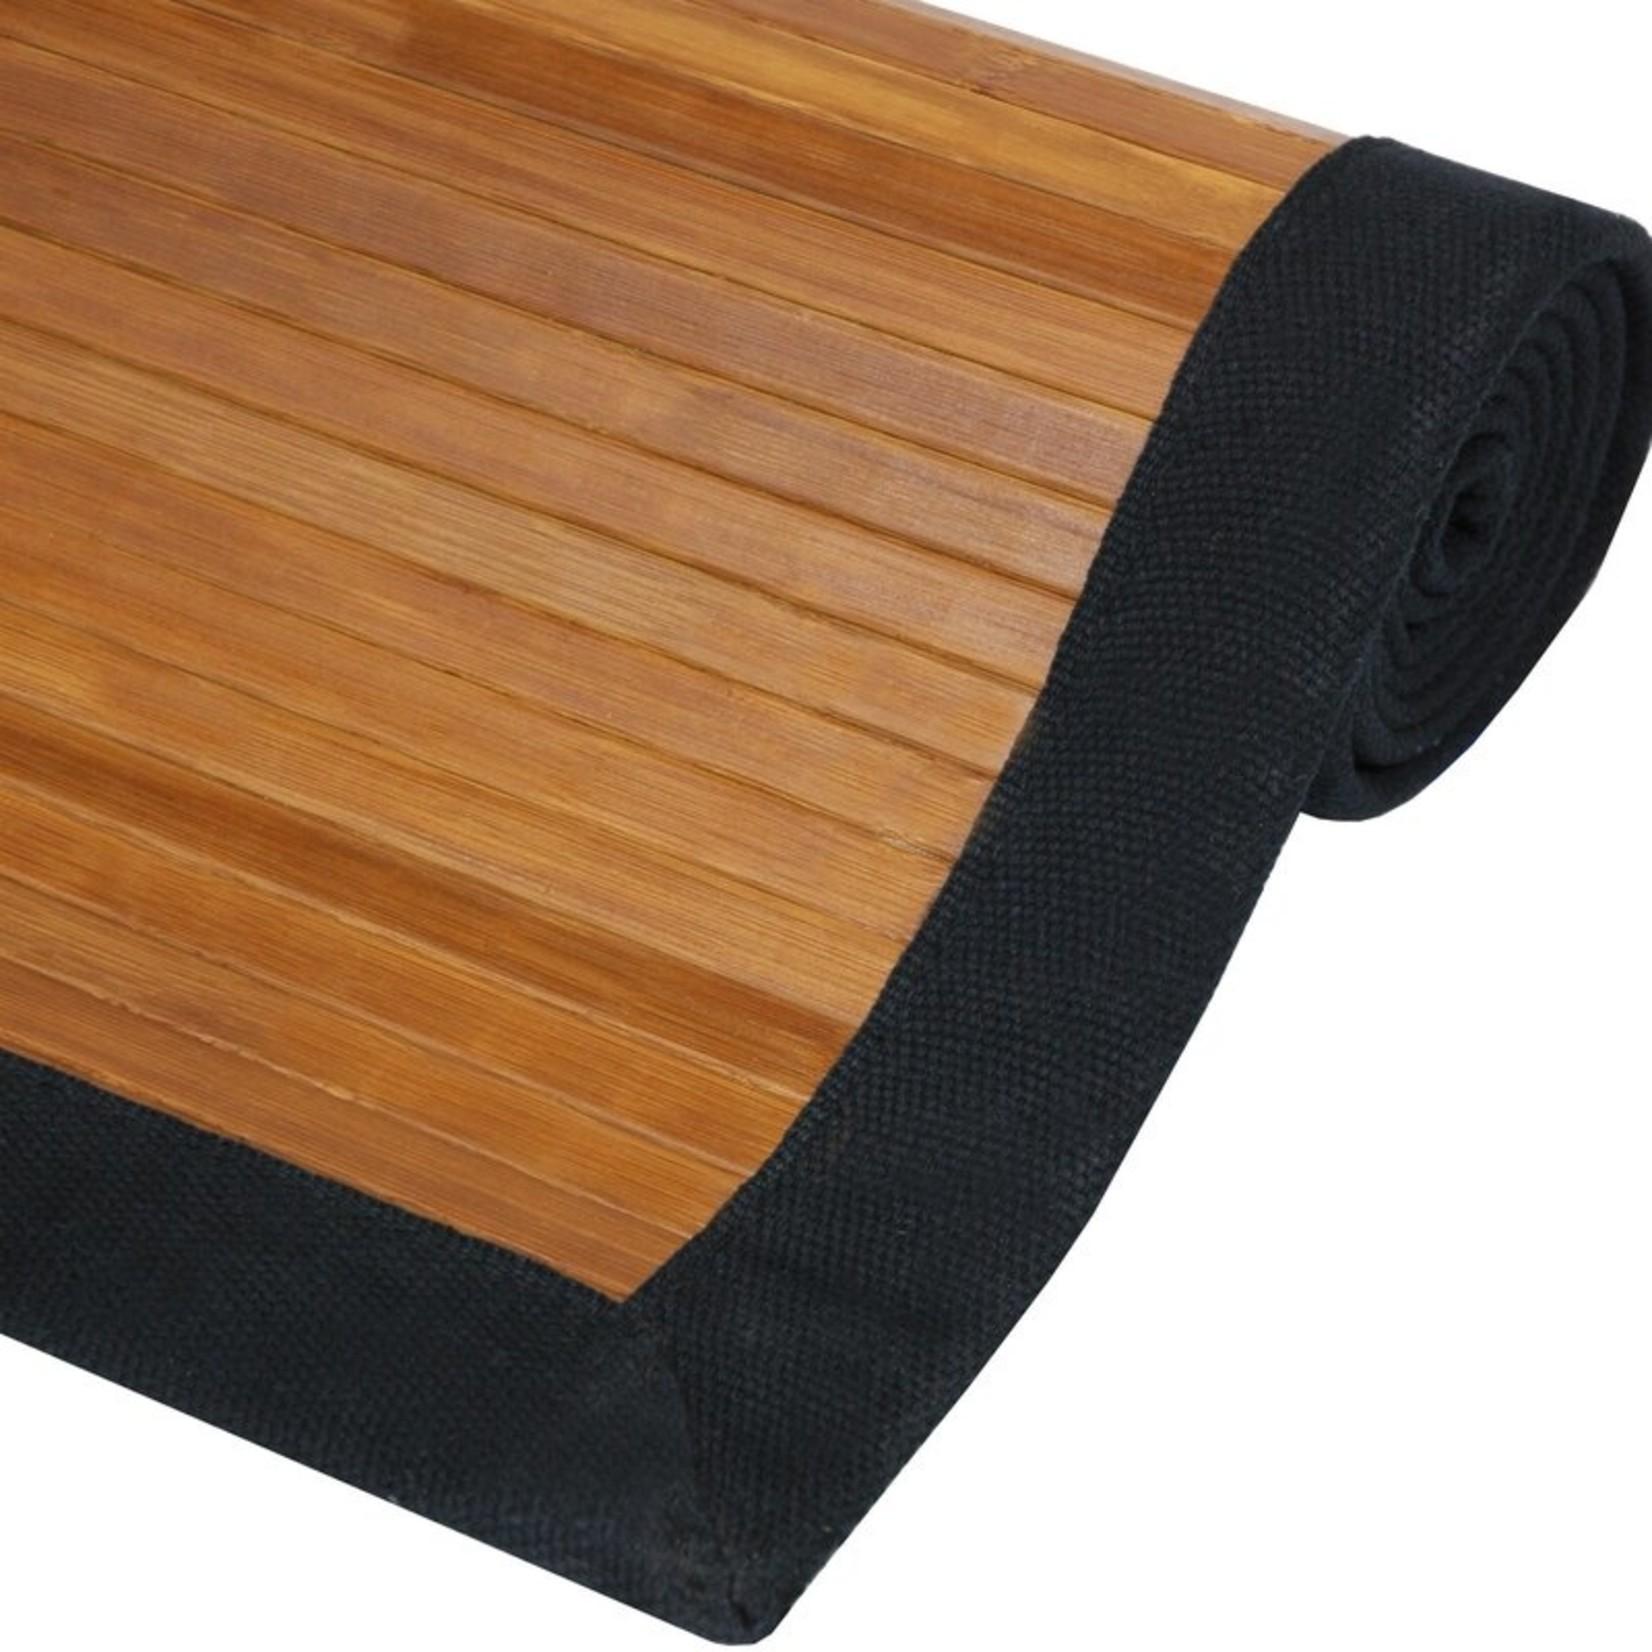 *2' x 3' - Solihull Burnt Bamboo Area Rug